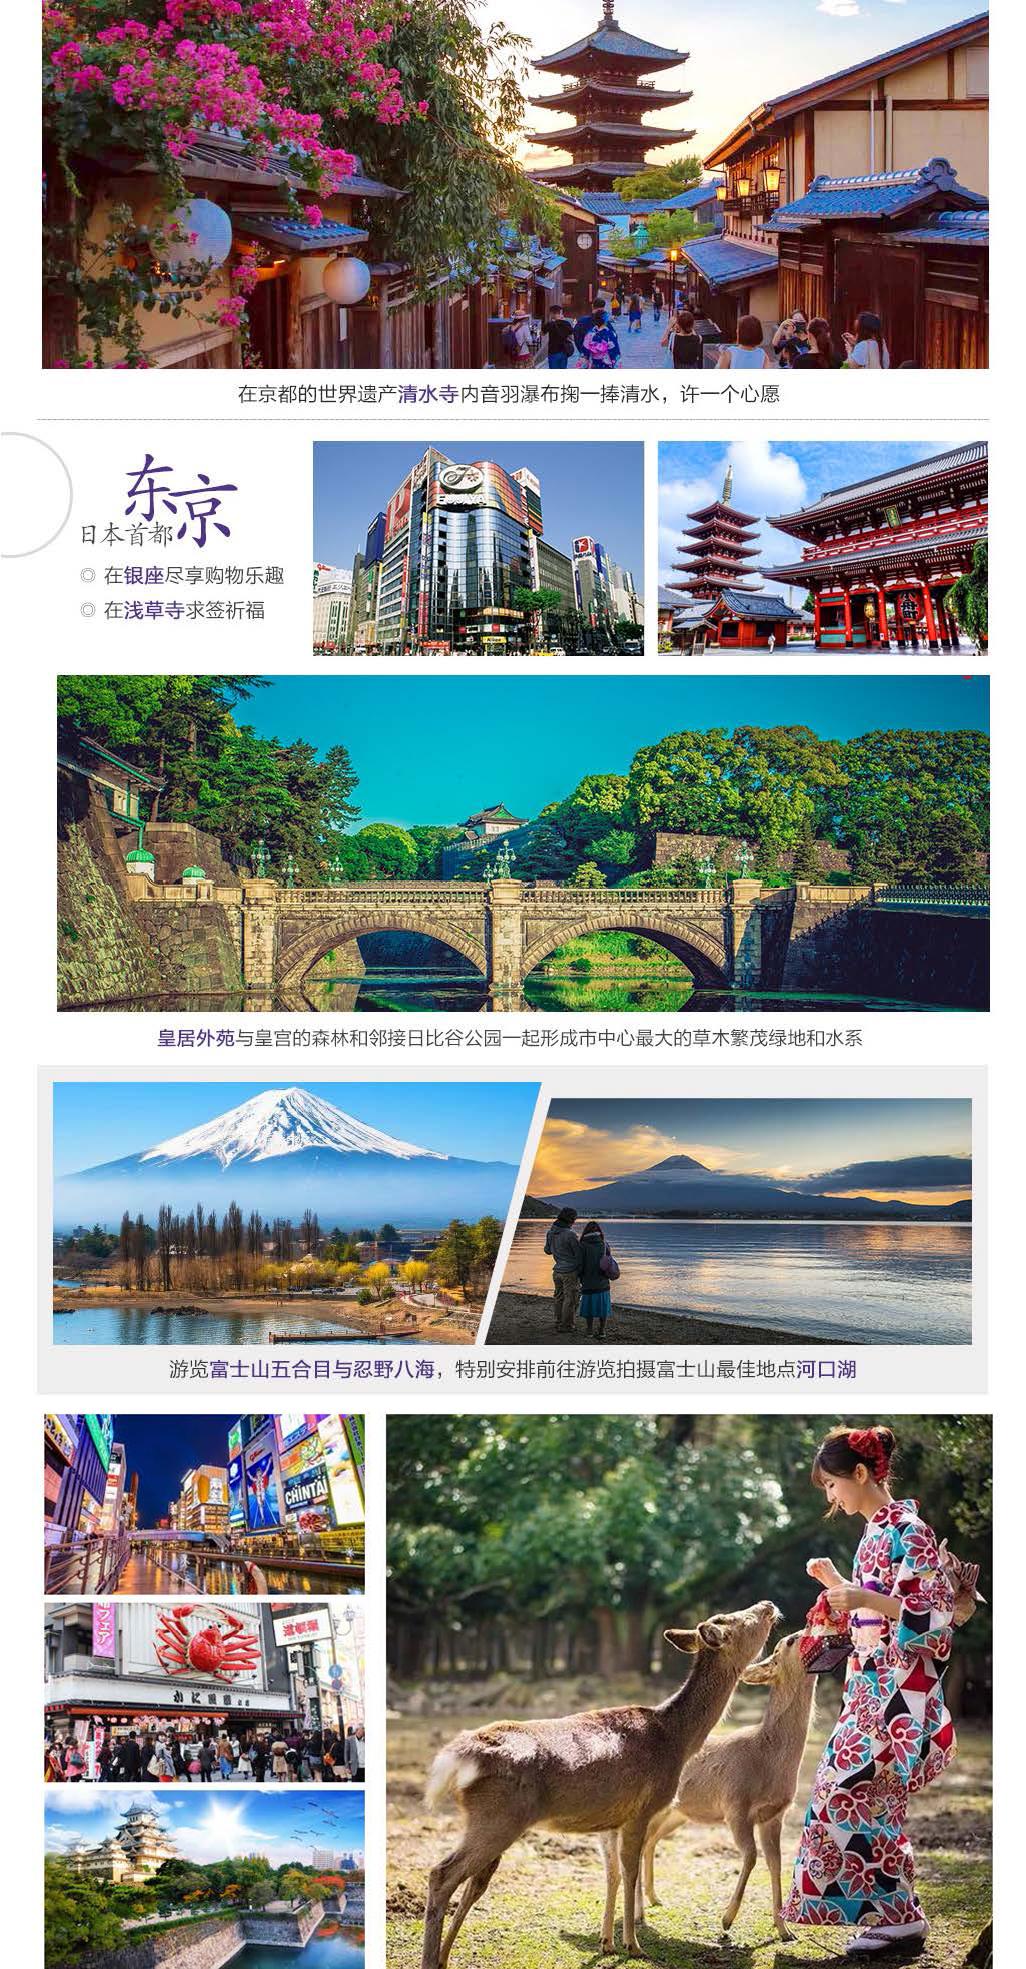 漫步日本images-漫步日本本州_03